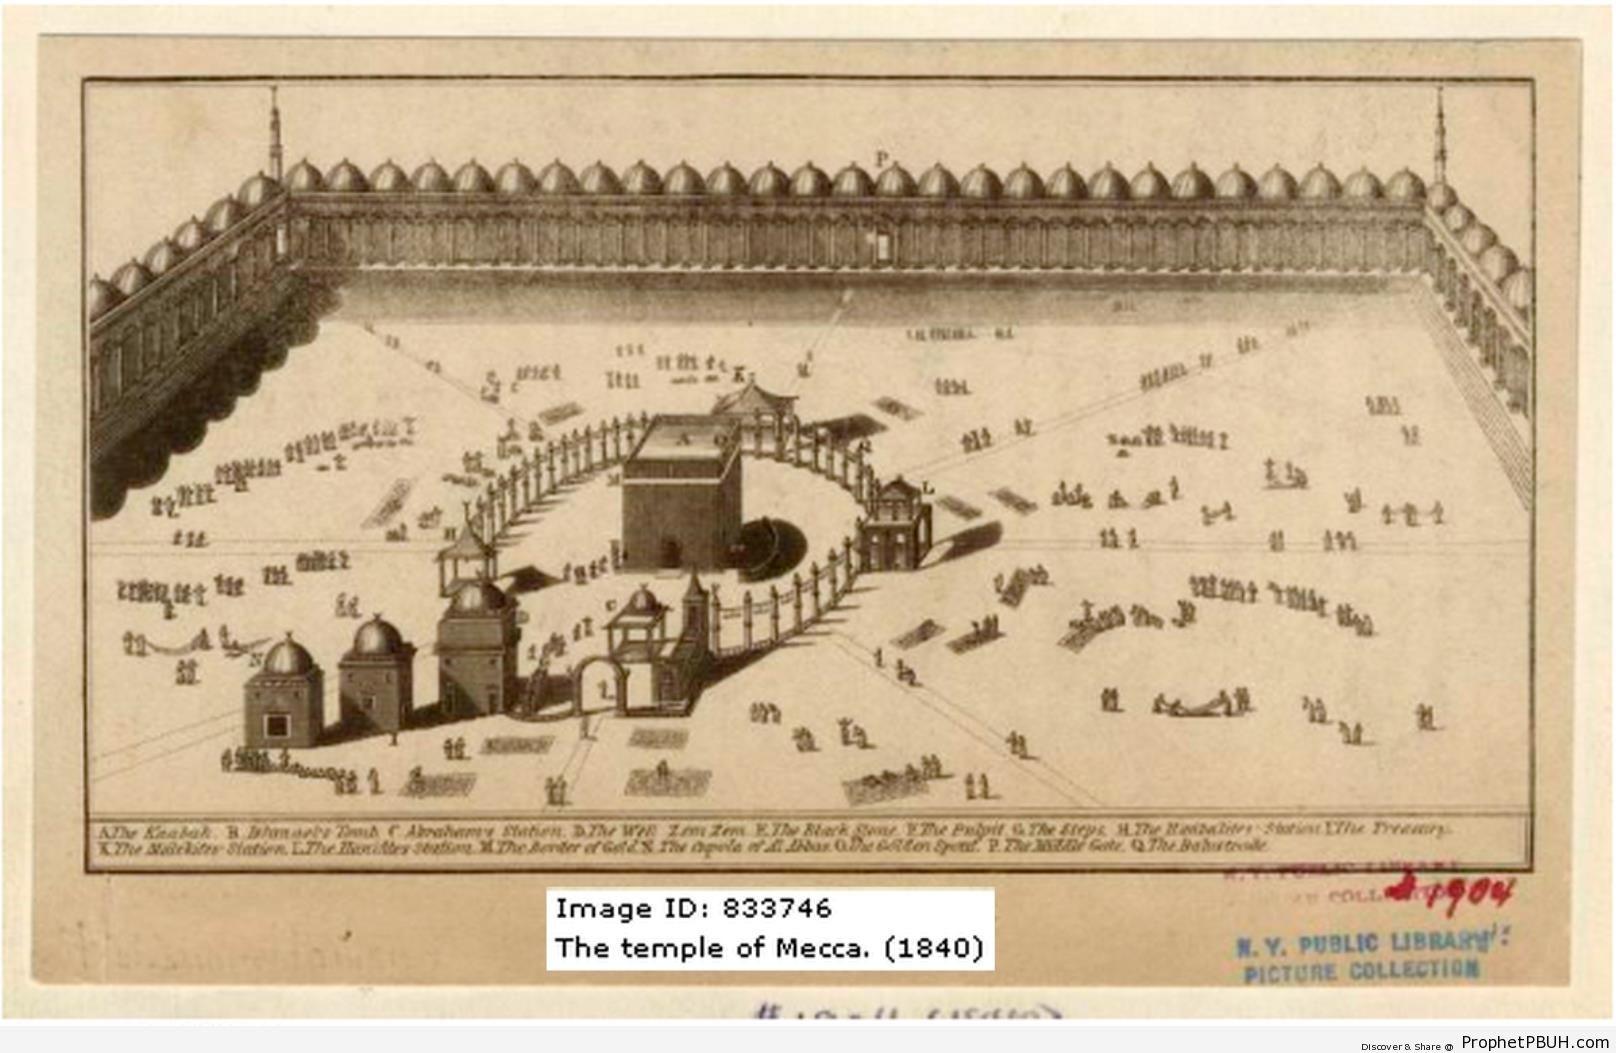 1840 Drawing of Masjid al-Haram - al-Masjid al-Haram in Makkah, Saudi Arabia -Picture